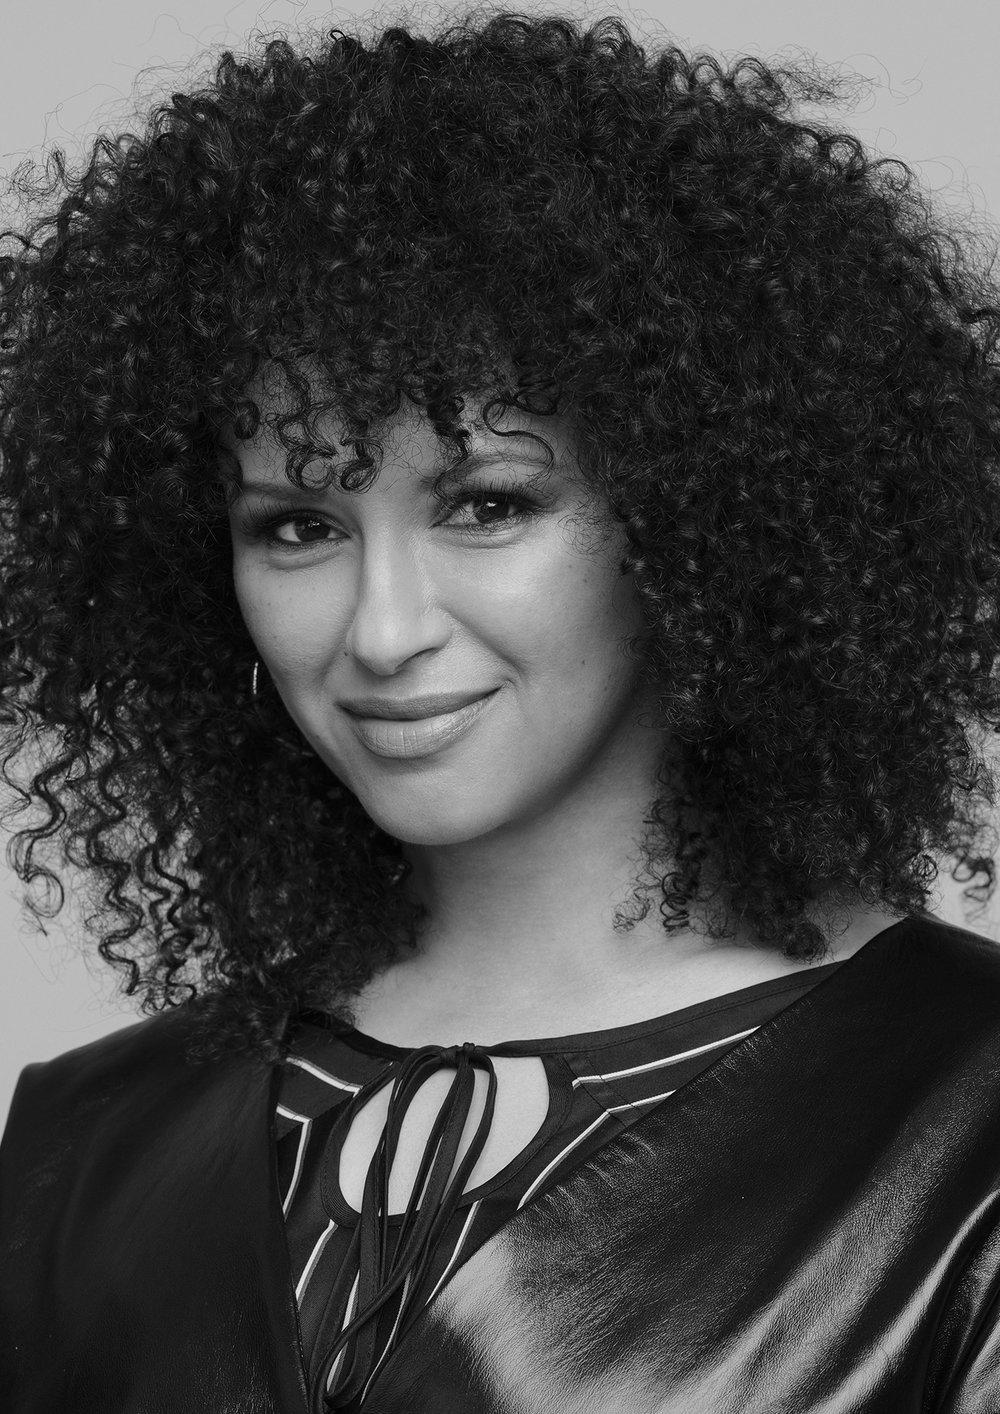 Vanessa craft - Speaker atCoco Con: MediaApril 25th, 2019Four Seasons Hotel Toronto